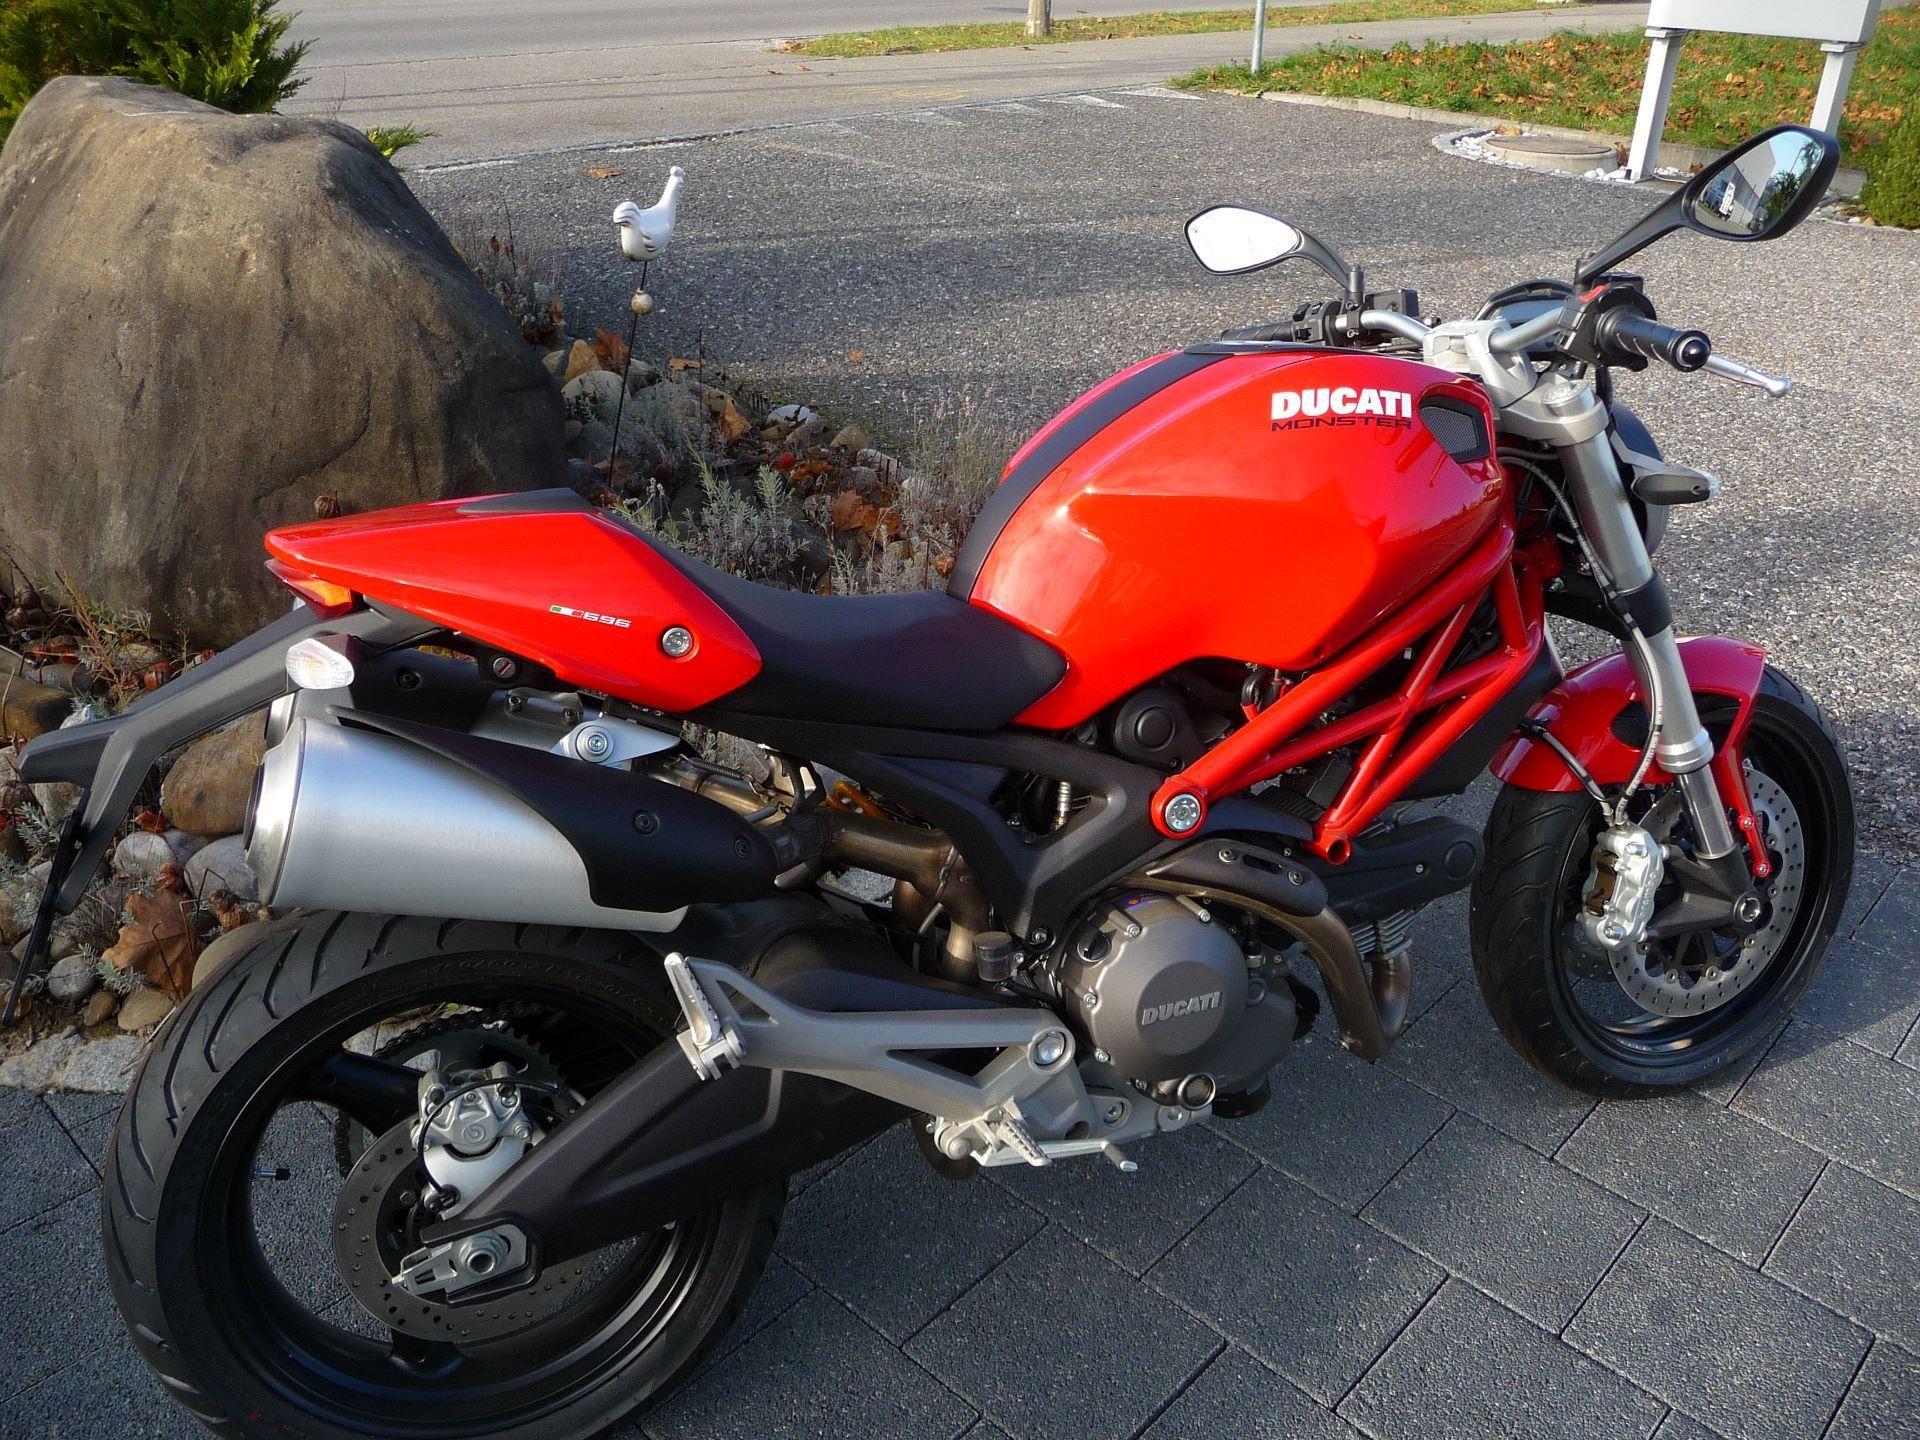 moto neuve acheter ducati 696 monster abs moto kaufmann lyss lyss. Black Bedroom Furniture Sets. Home Design Ideas